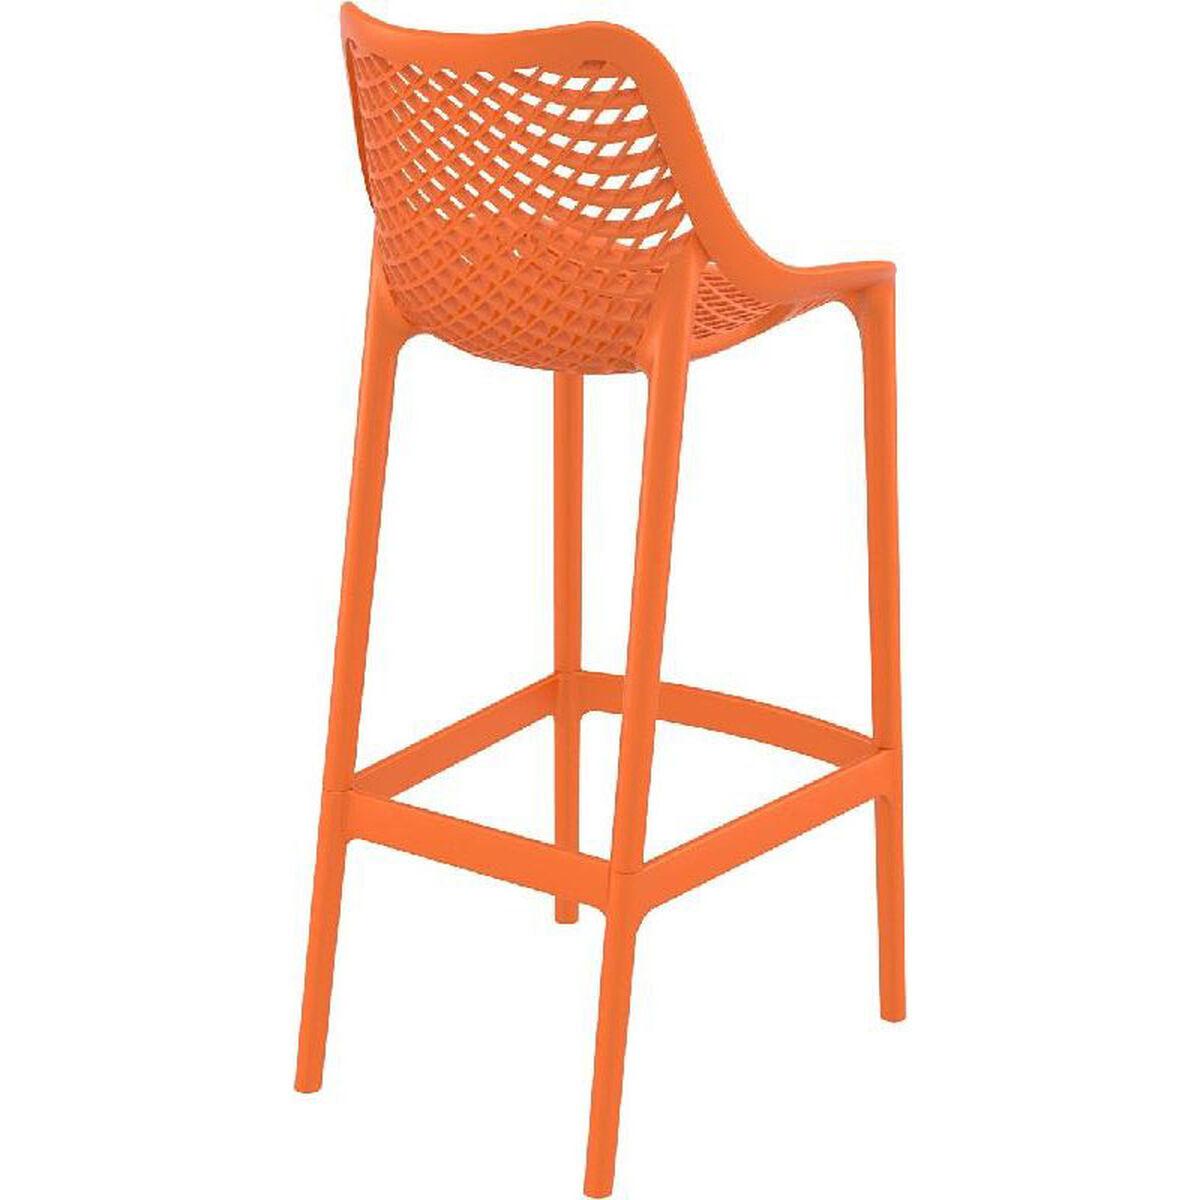 Orange Resin Outdoor Barstool Isp068 Ora Restaurantfurniture4less Com